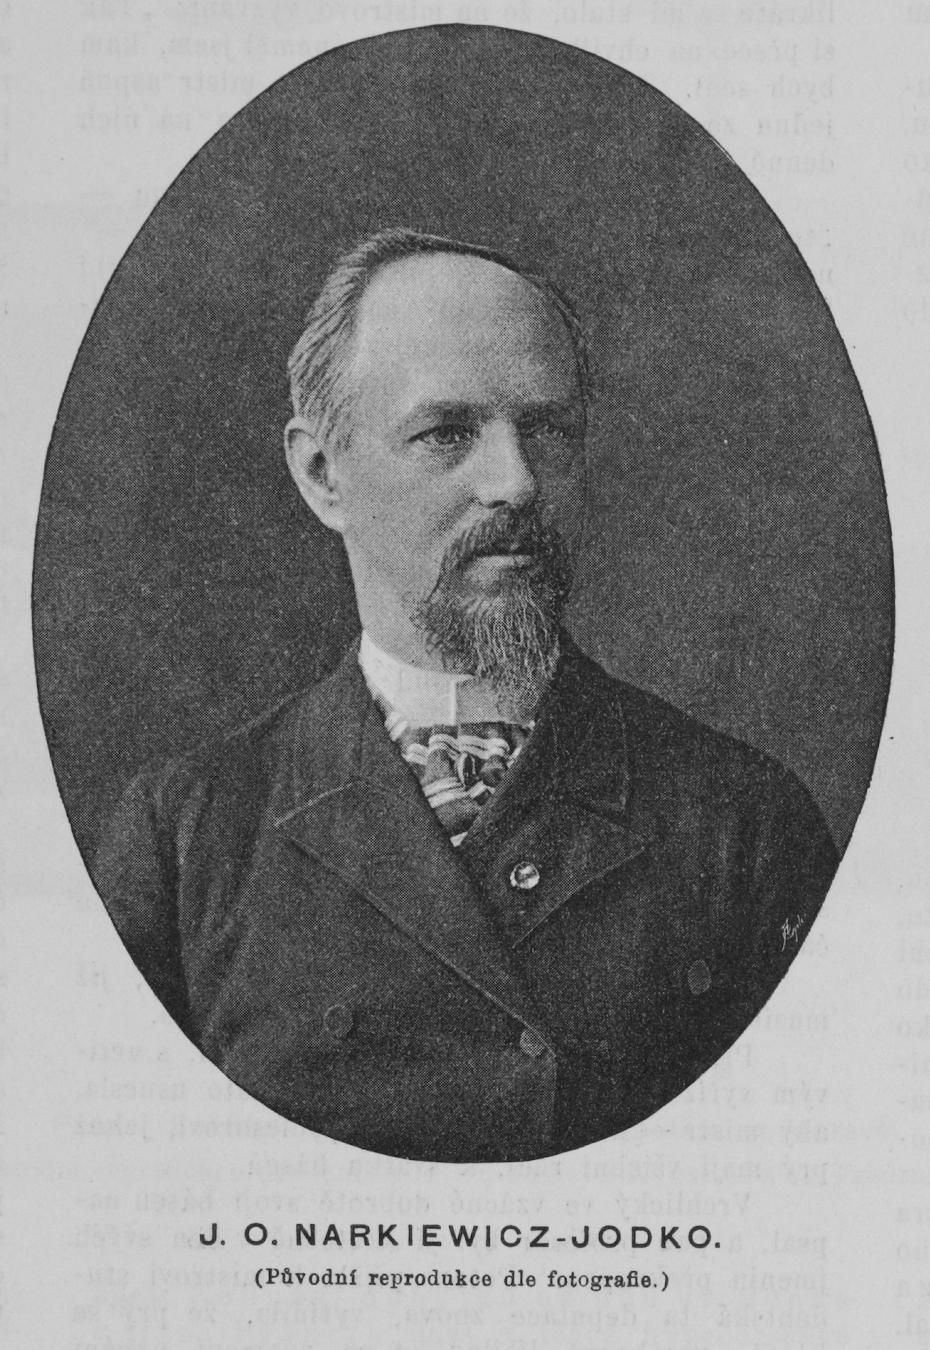 Jakub_Jodko_Narkiewicz_1892.png